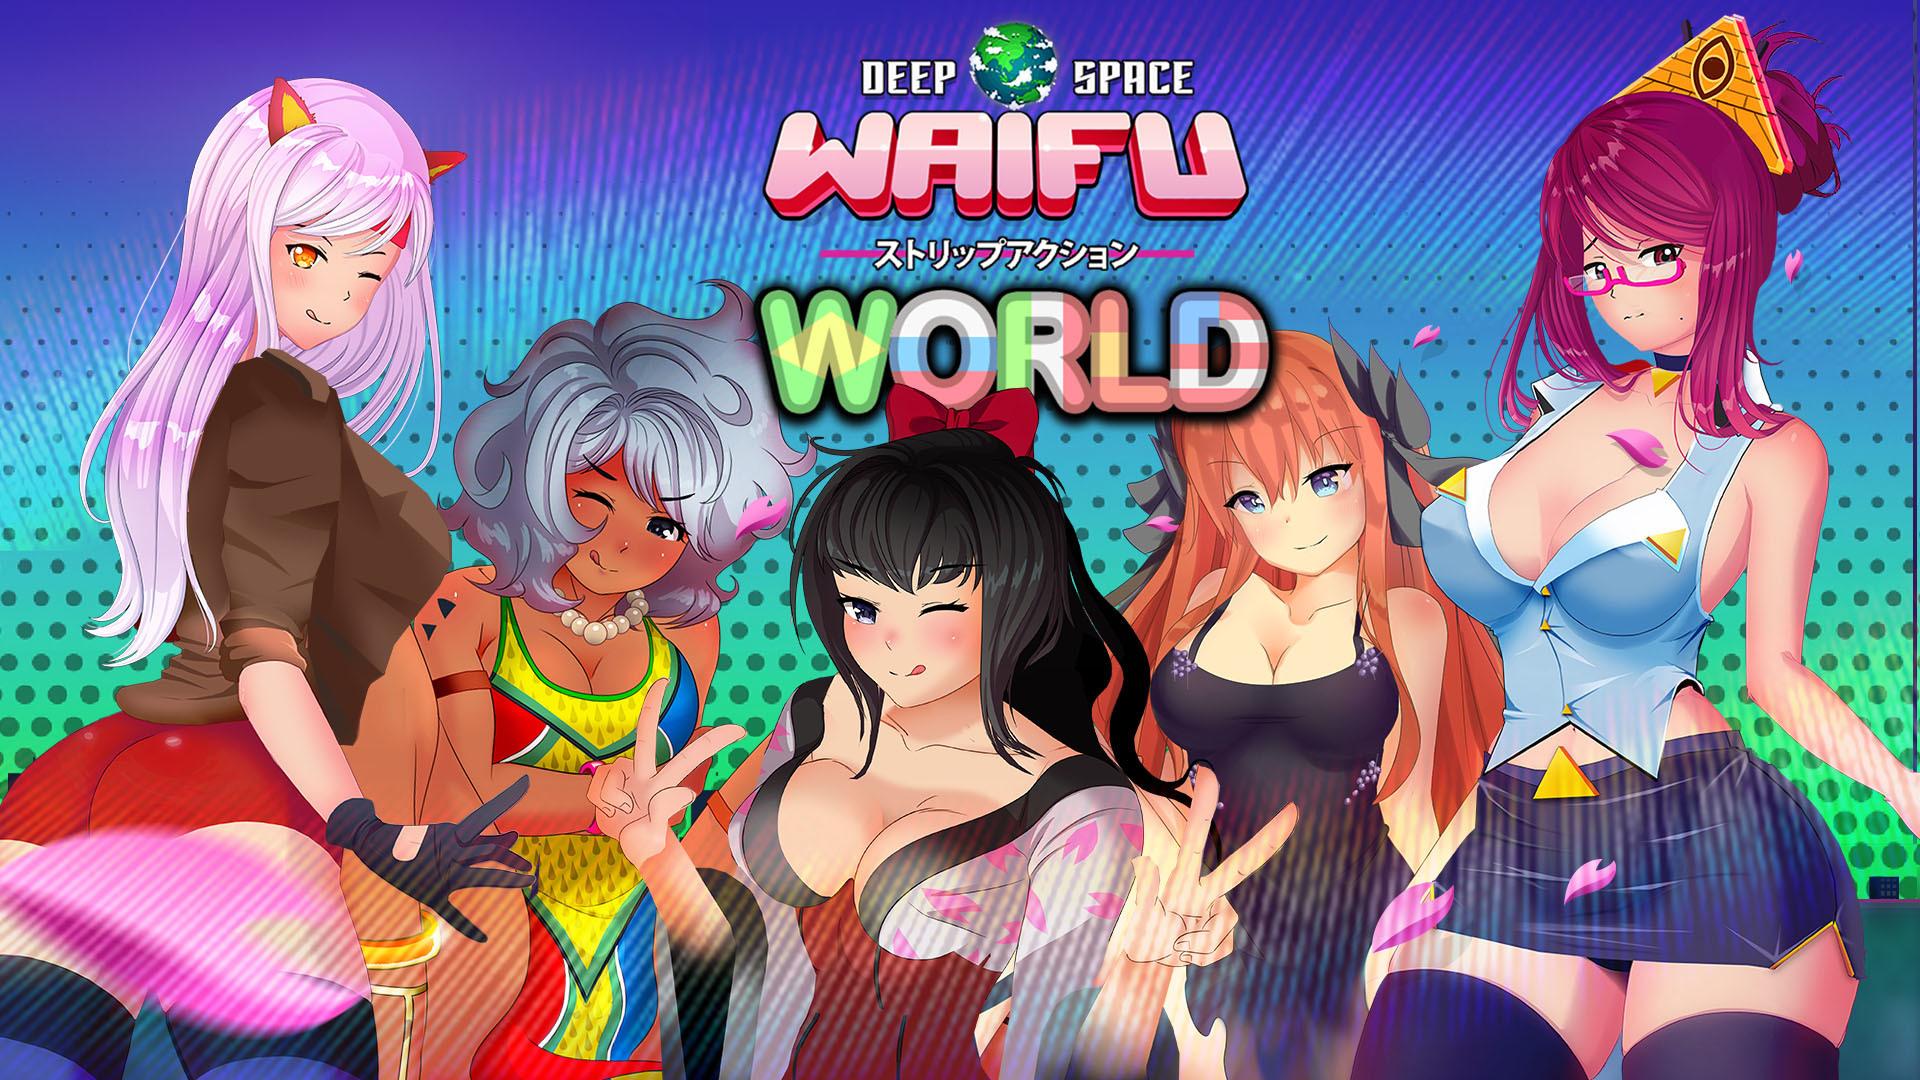 NEW GAME - DSW: WORLD